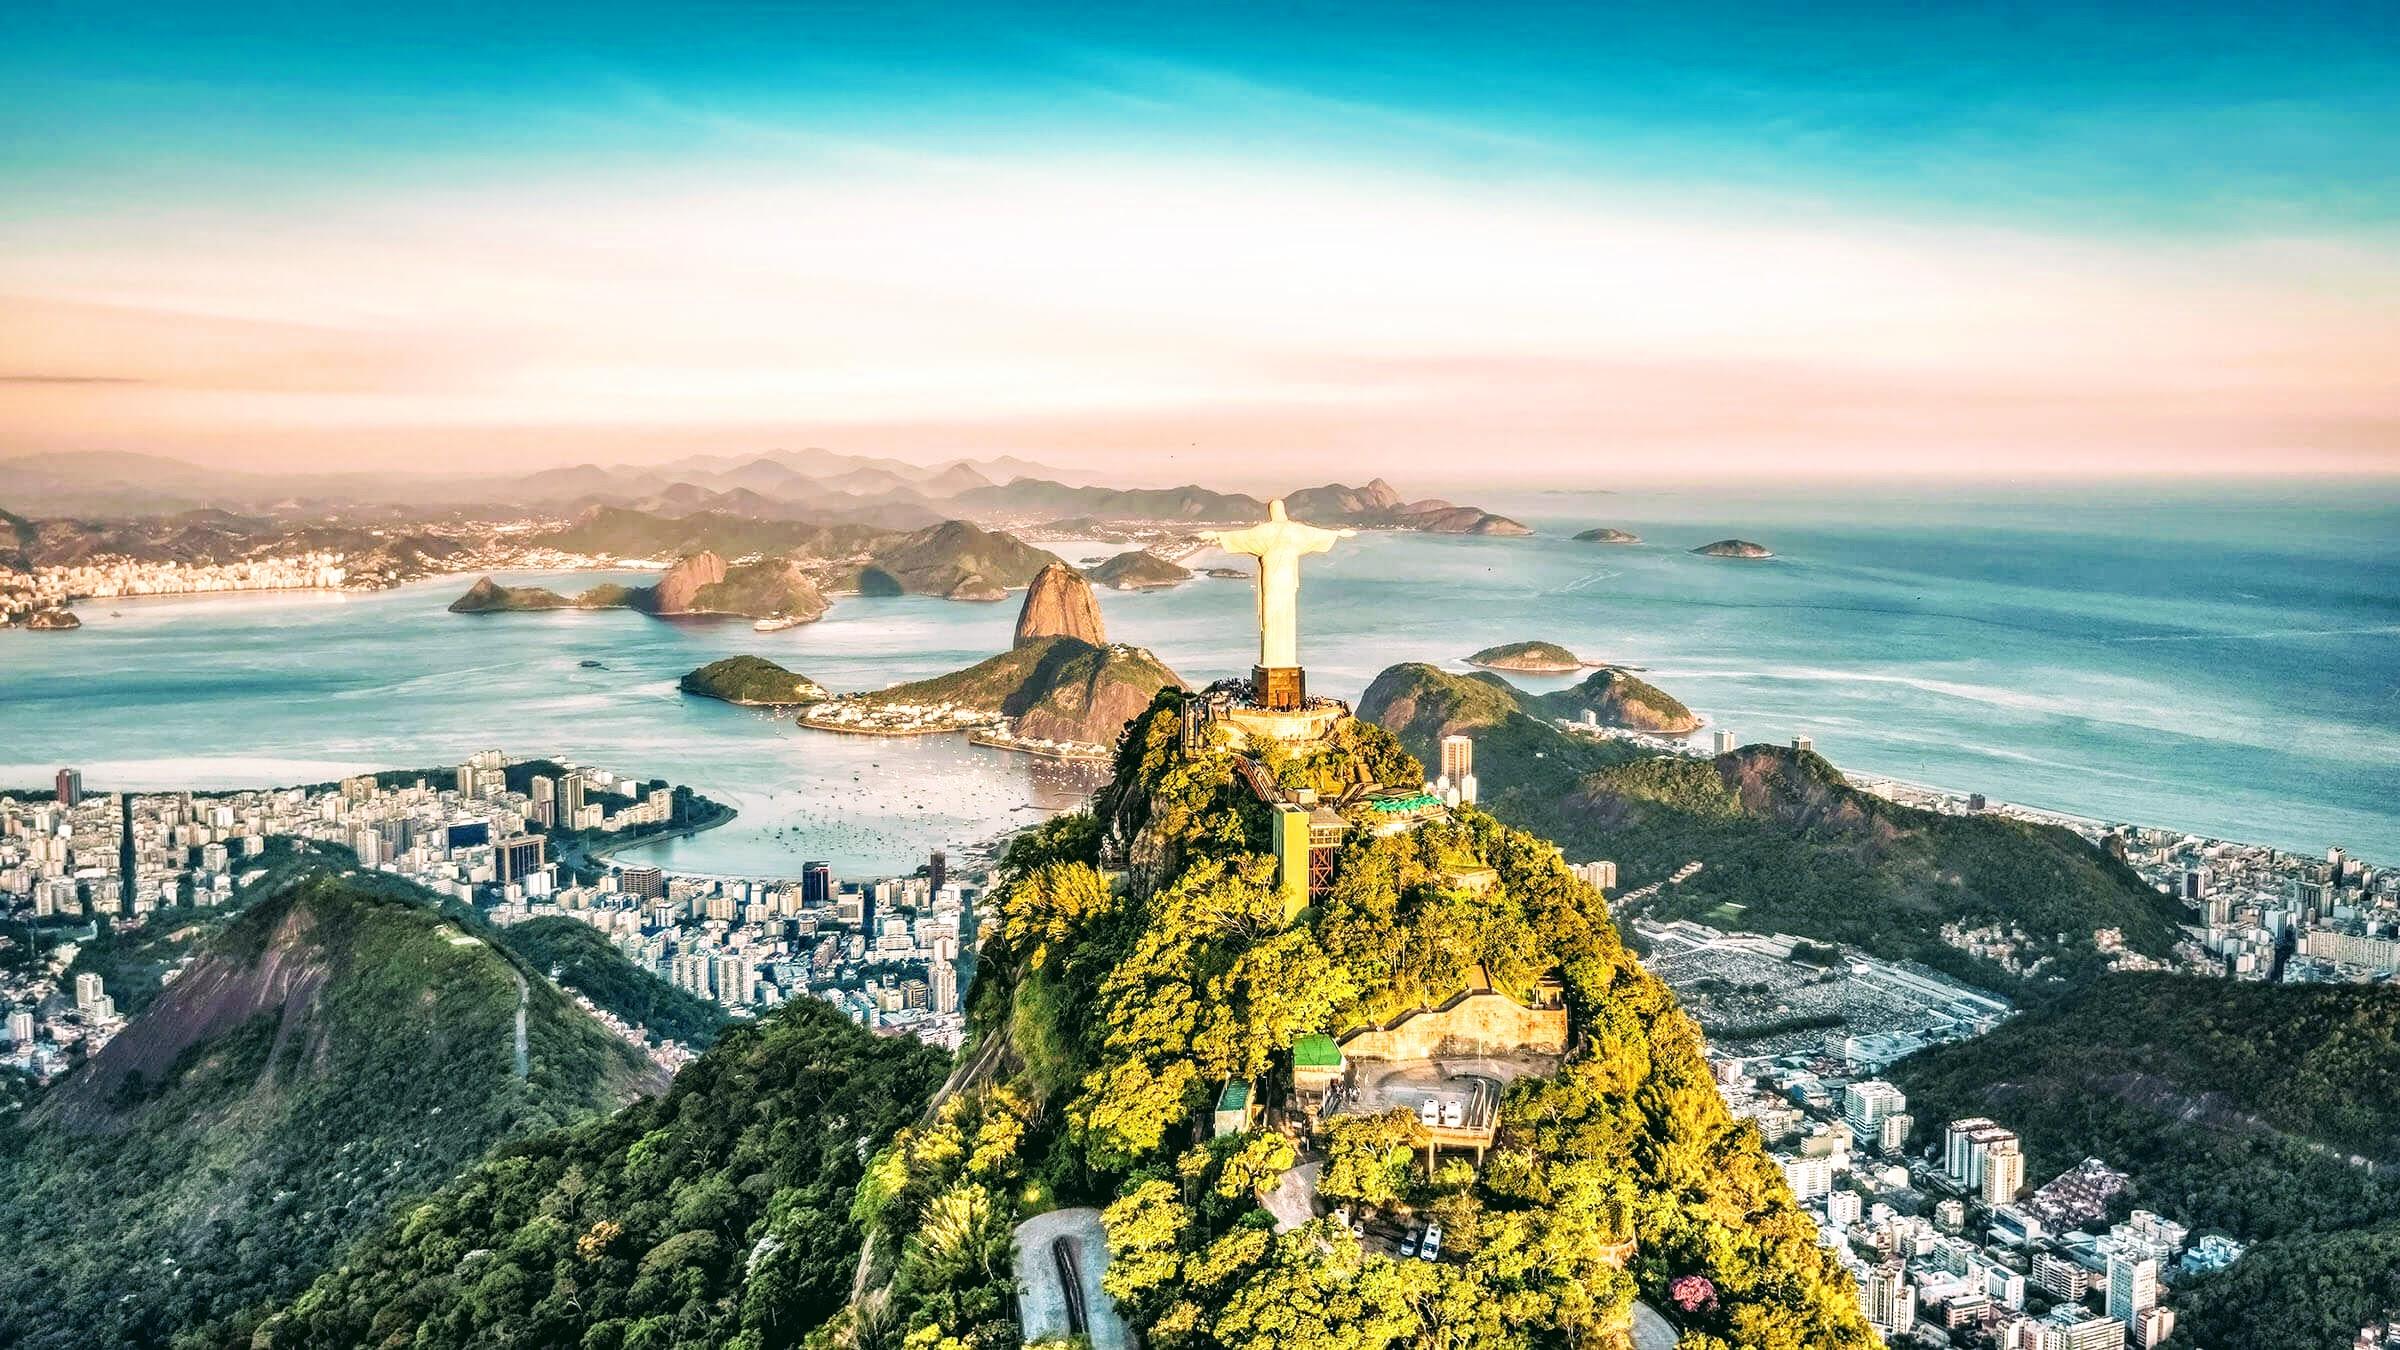 Asistencia-al-viajero-para-brasil